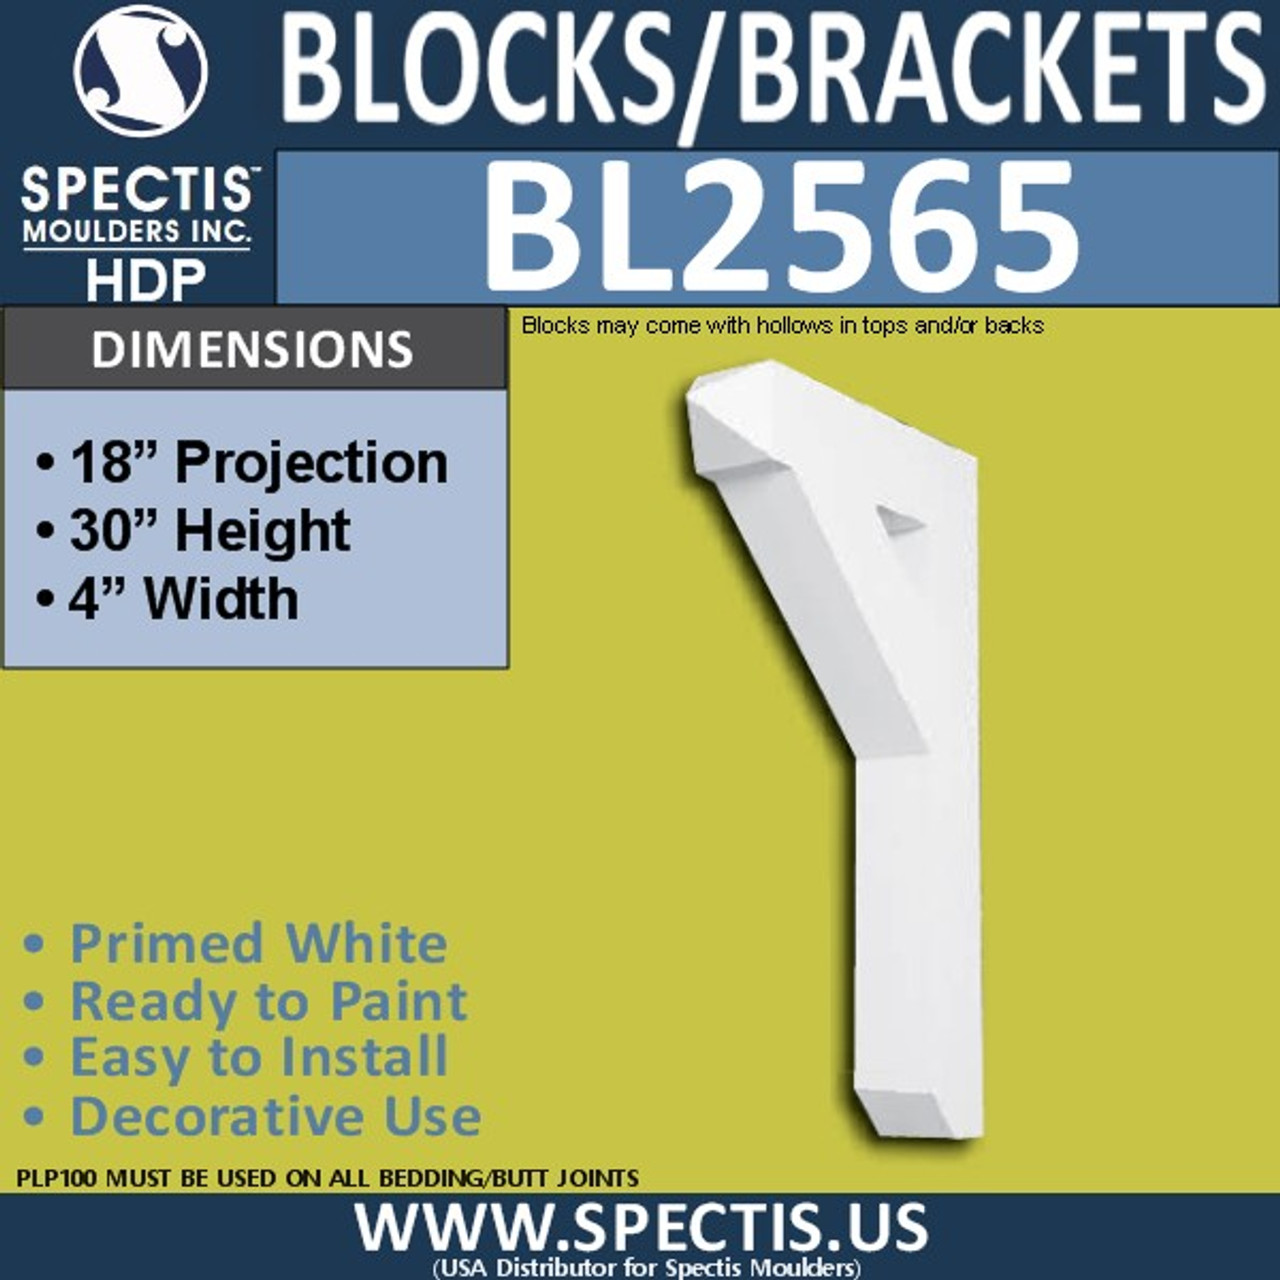 "BL2565 Eave Block or Bracket 4""W x 18""H x 30"" P"